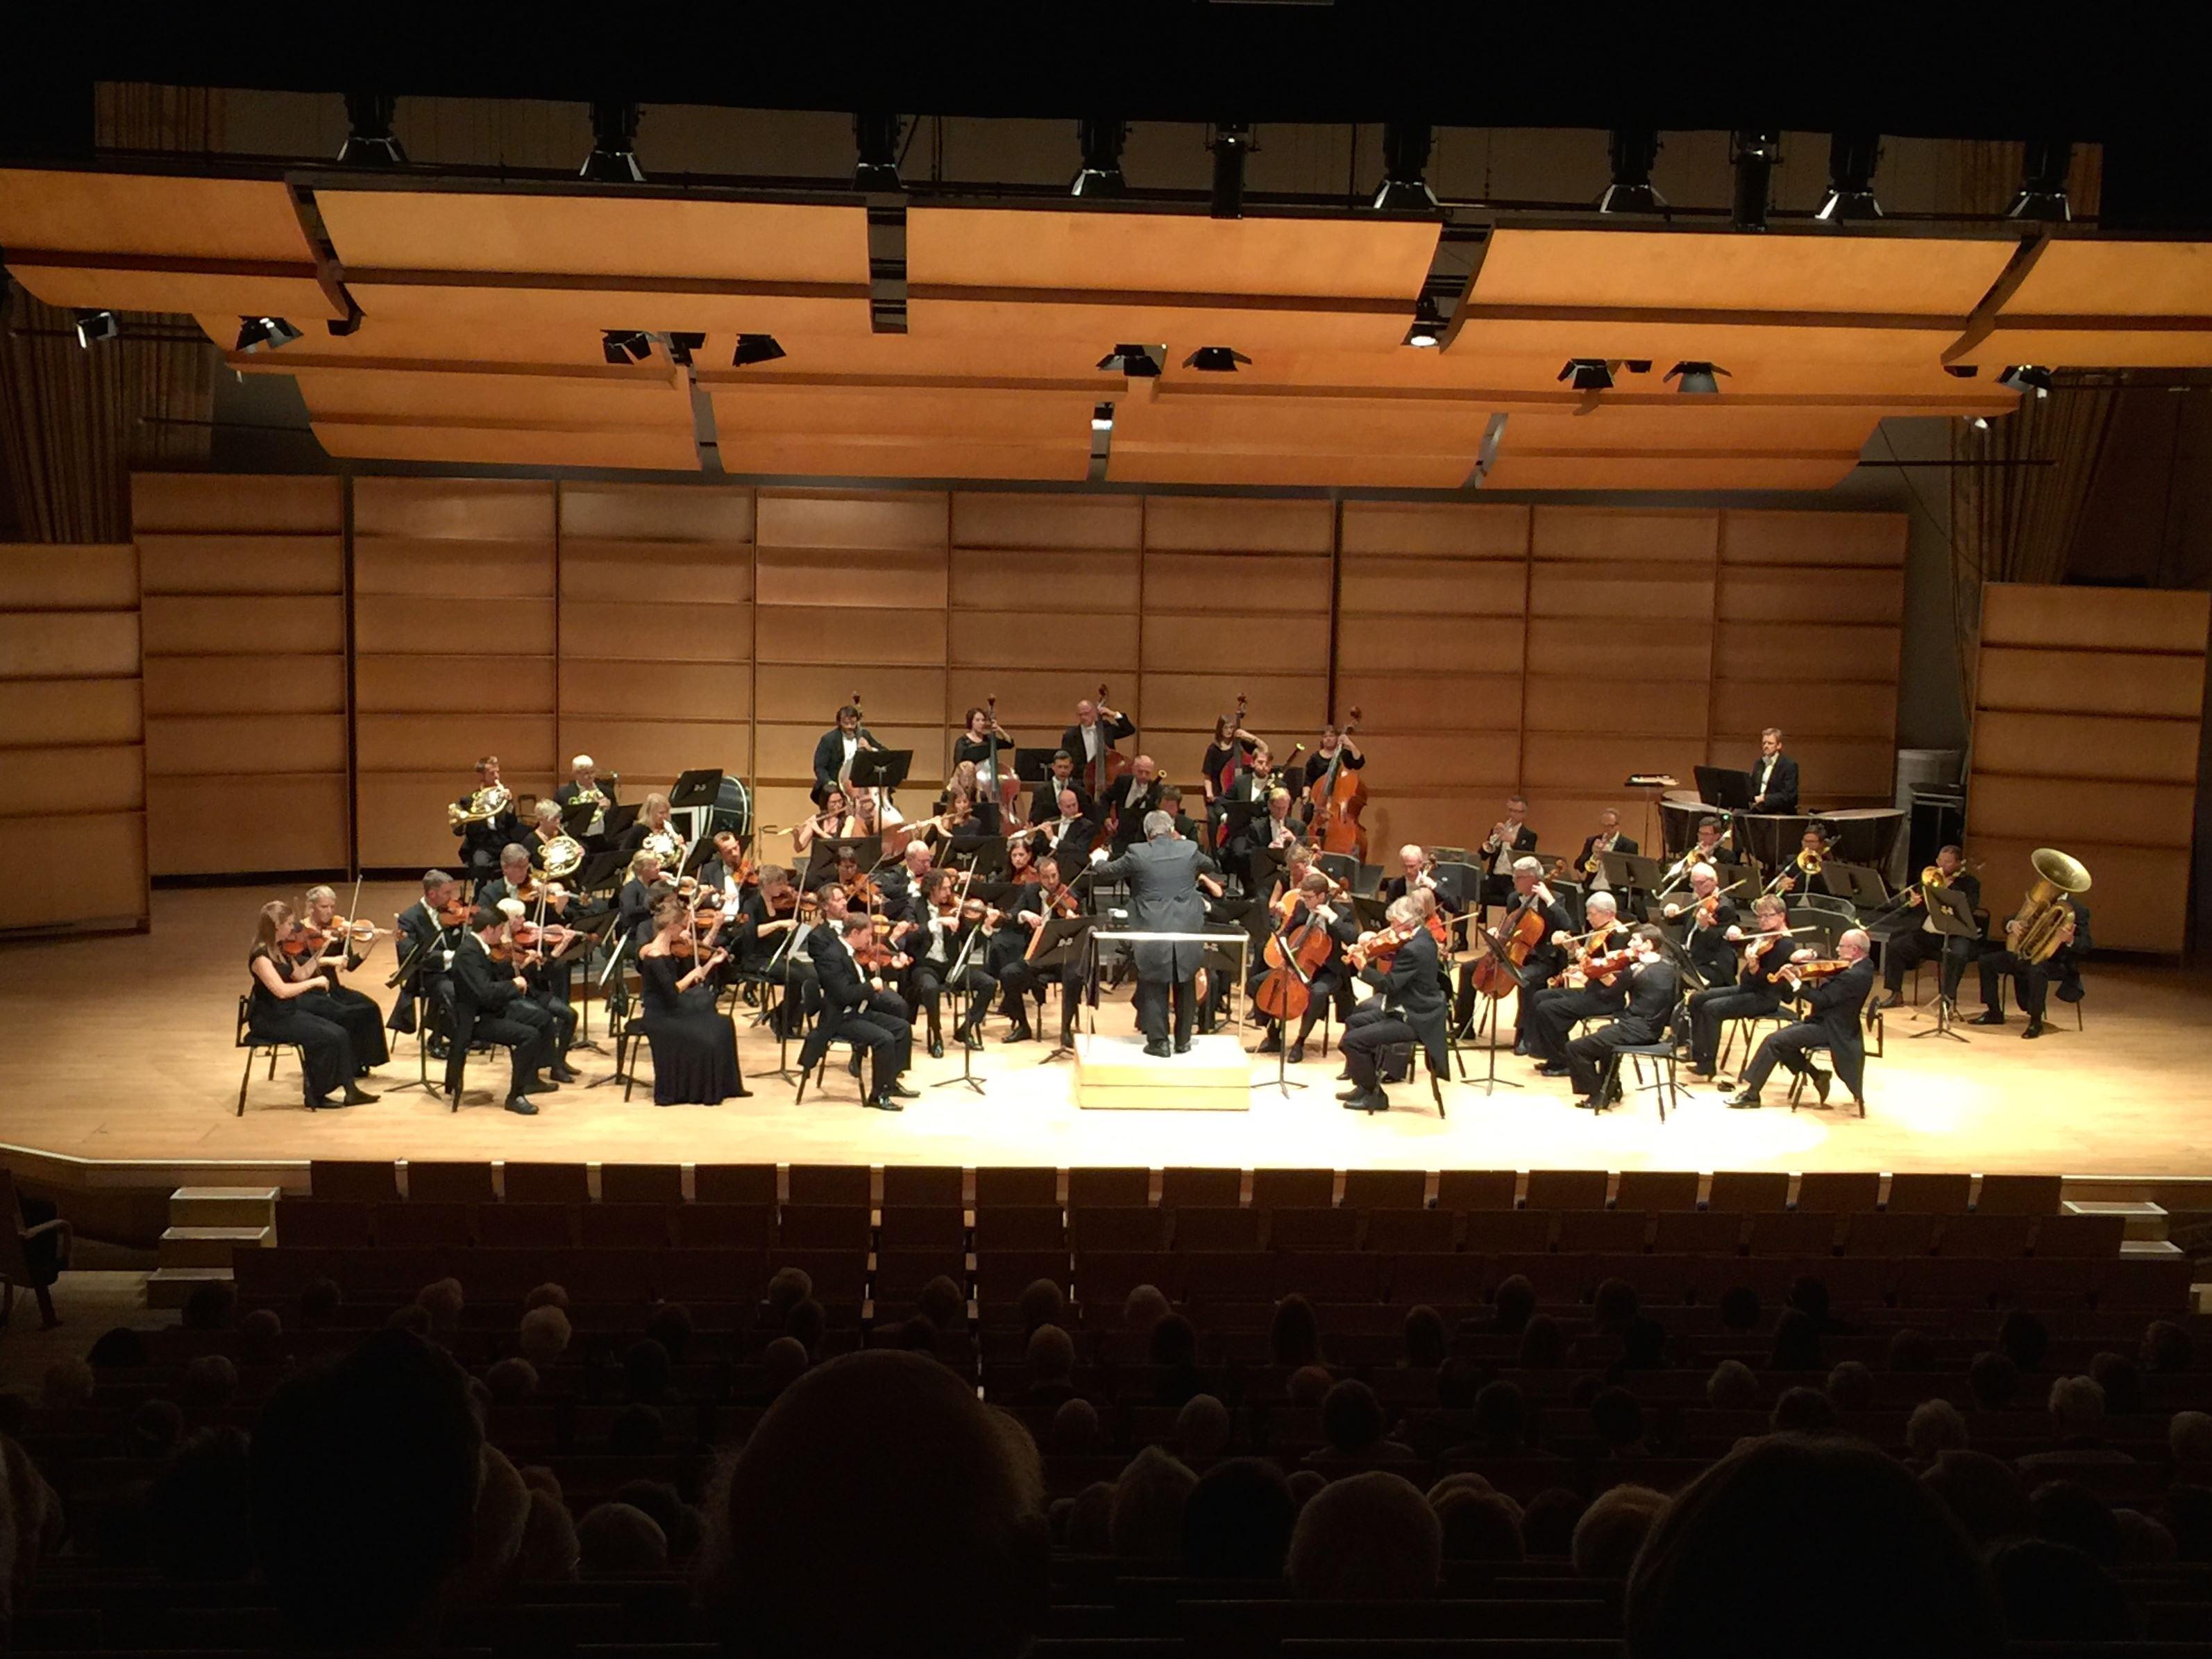 Koncert med Helsingborgs Symfoniorkester